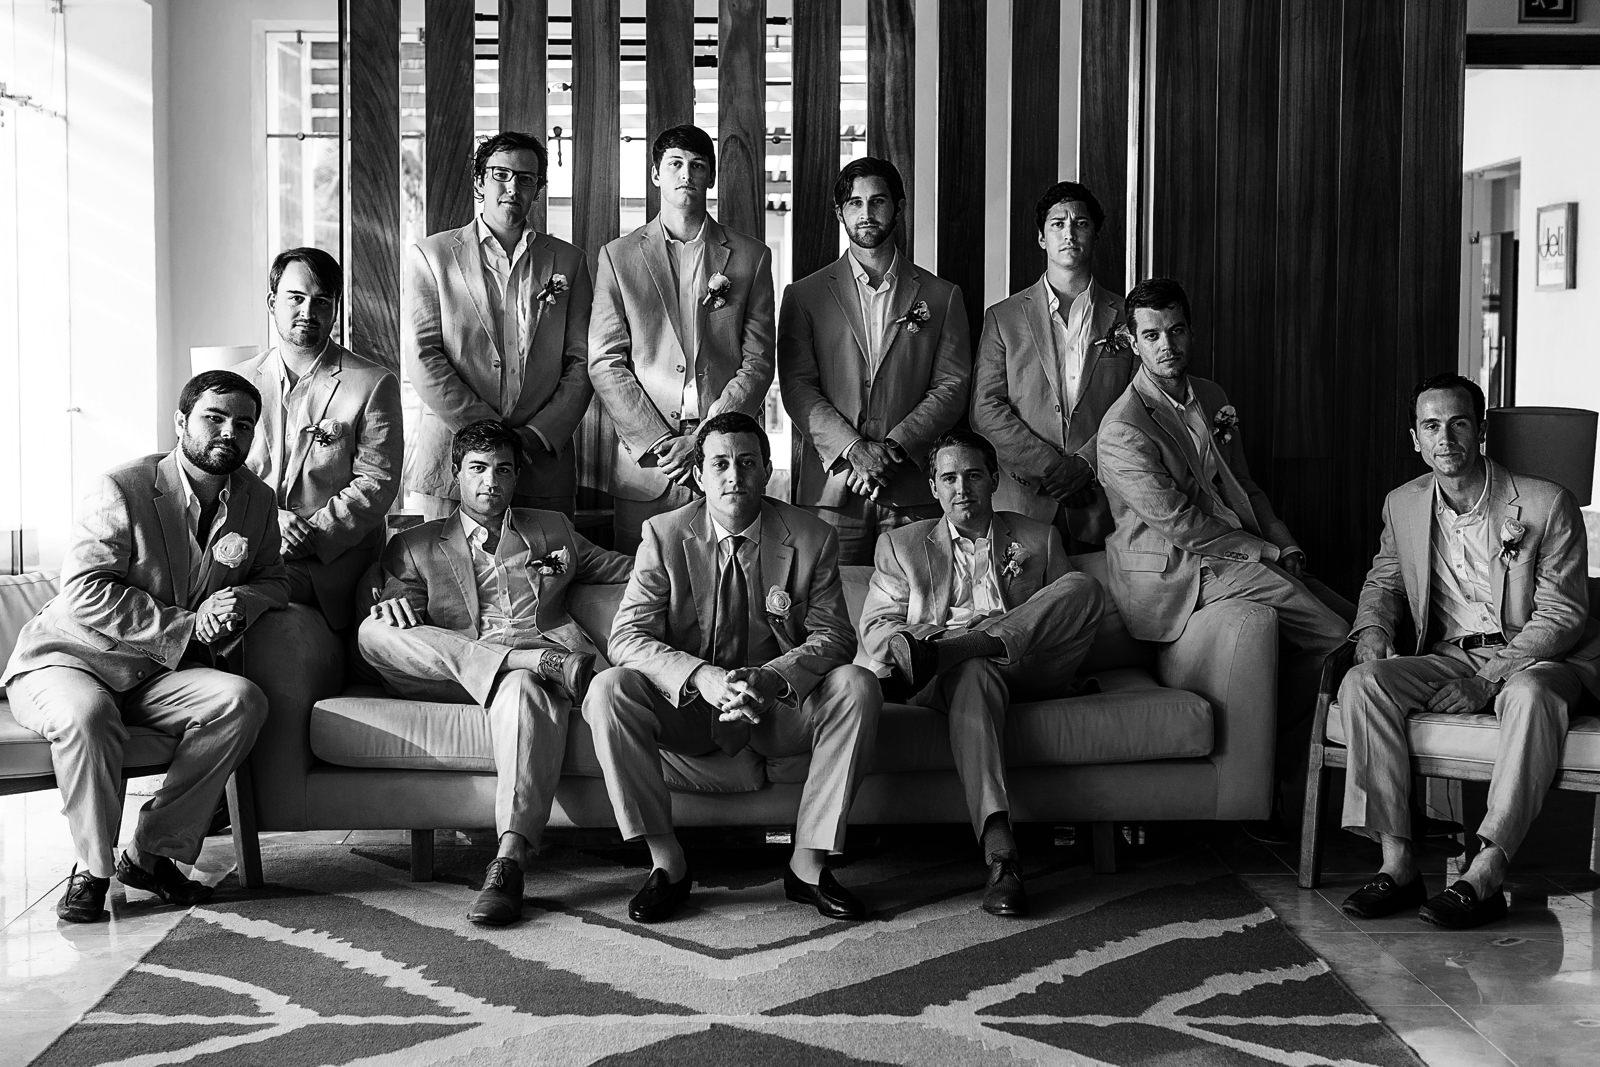 Groom with groomsmen portrait at sunset bar in Hyatt Ziva resort - Eder Acevedo cancun los cabos vallarta wedding photographer